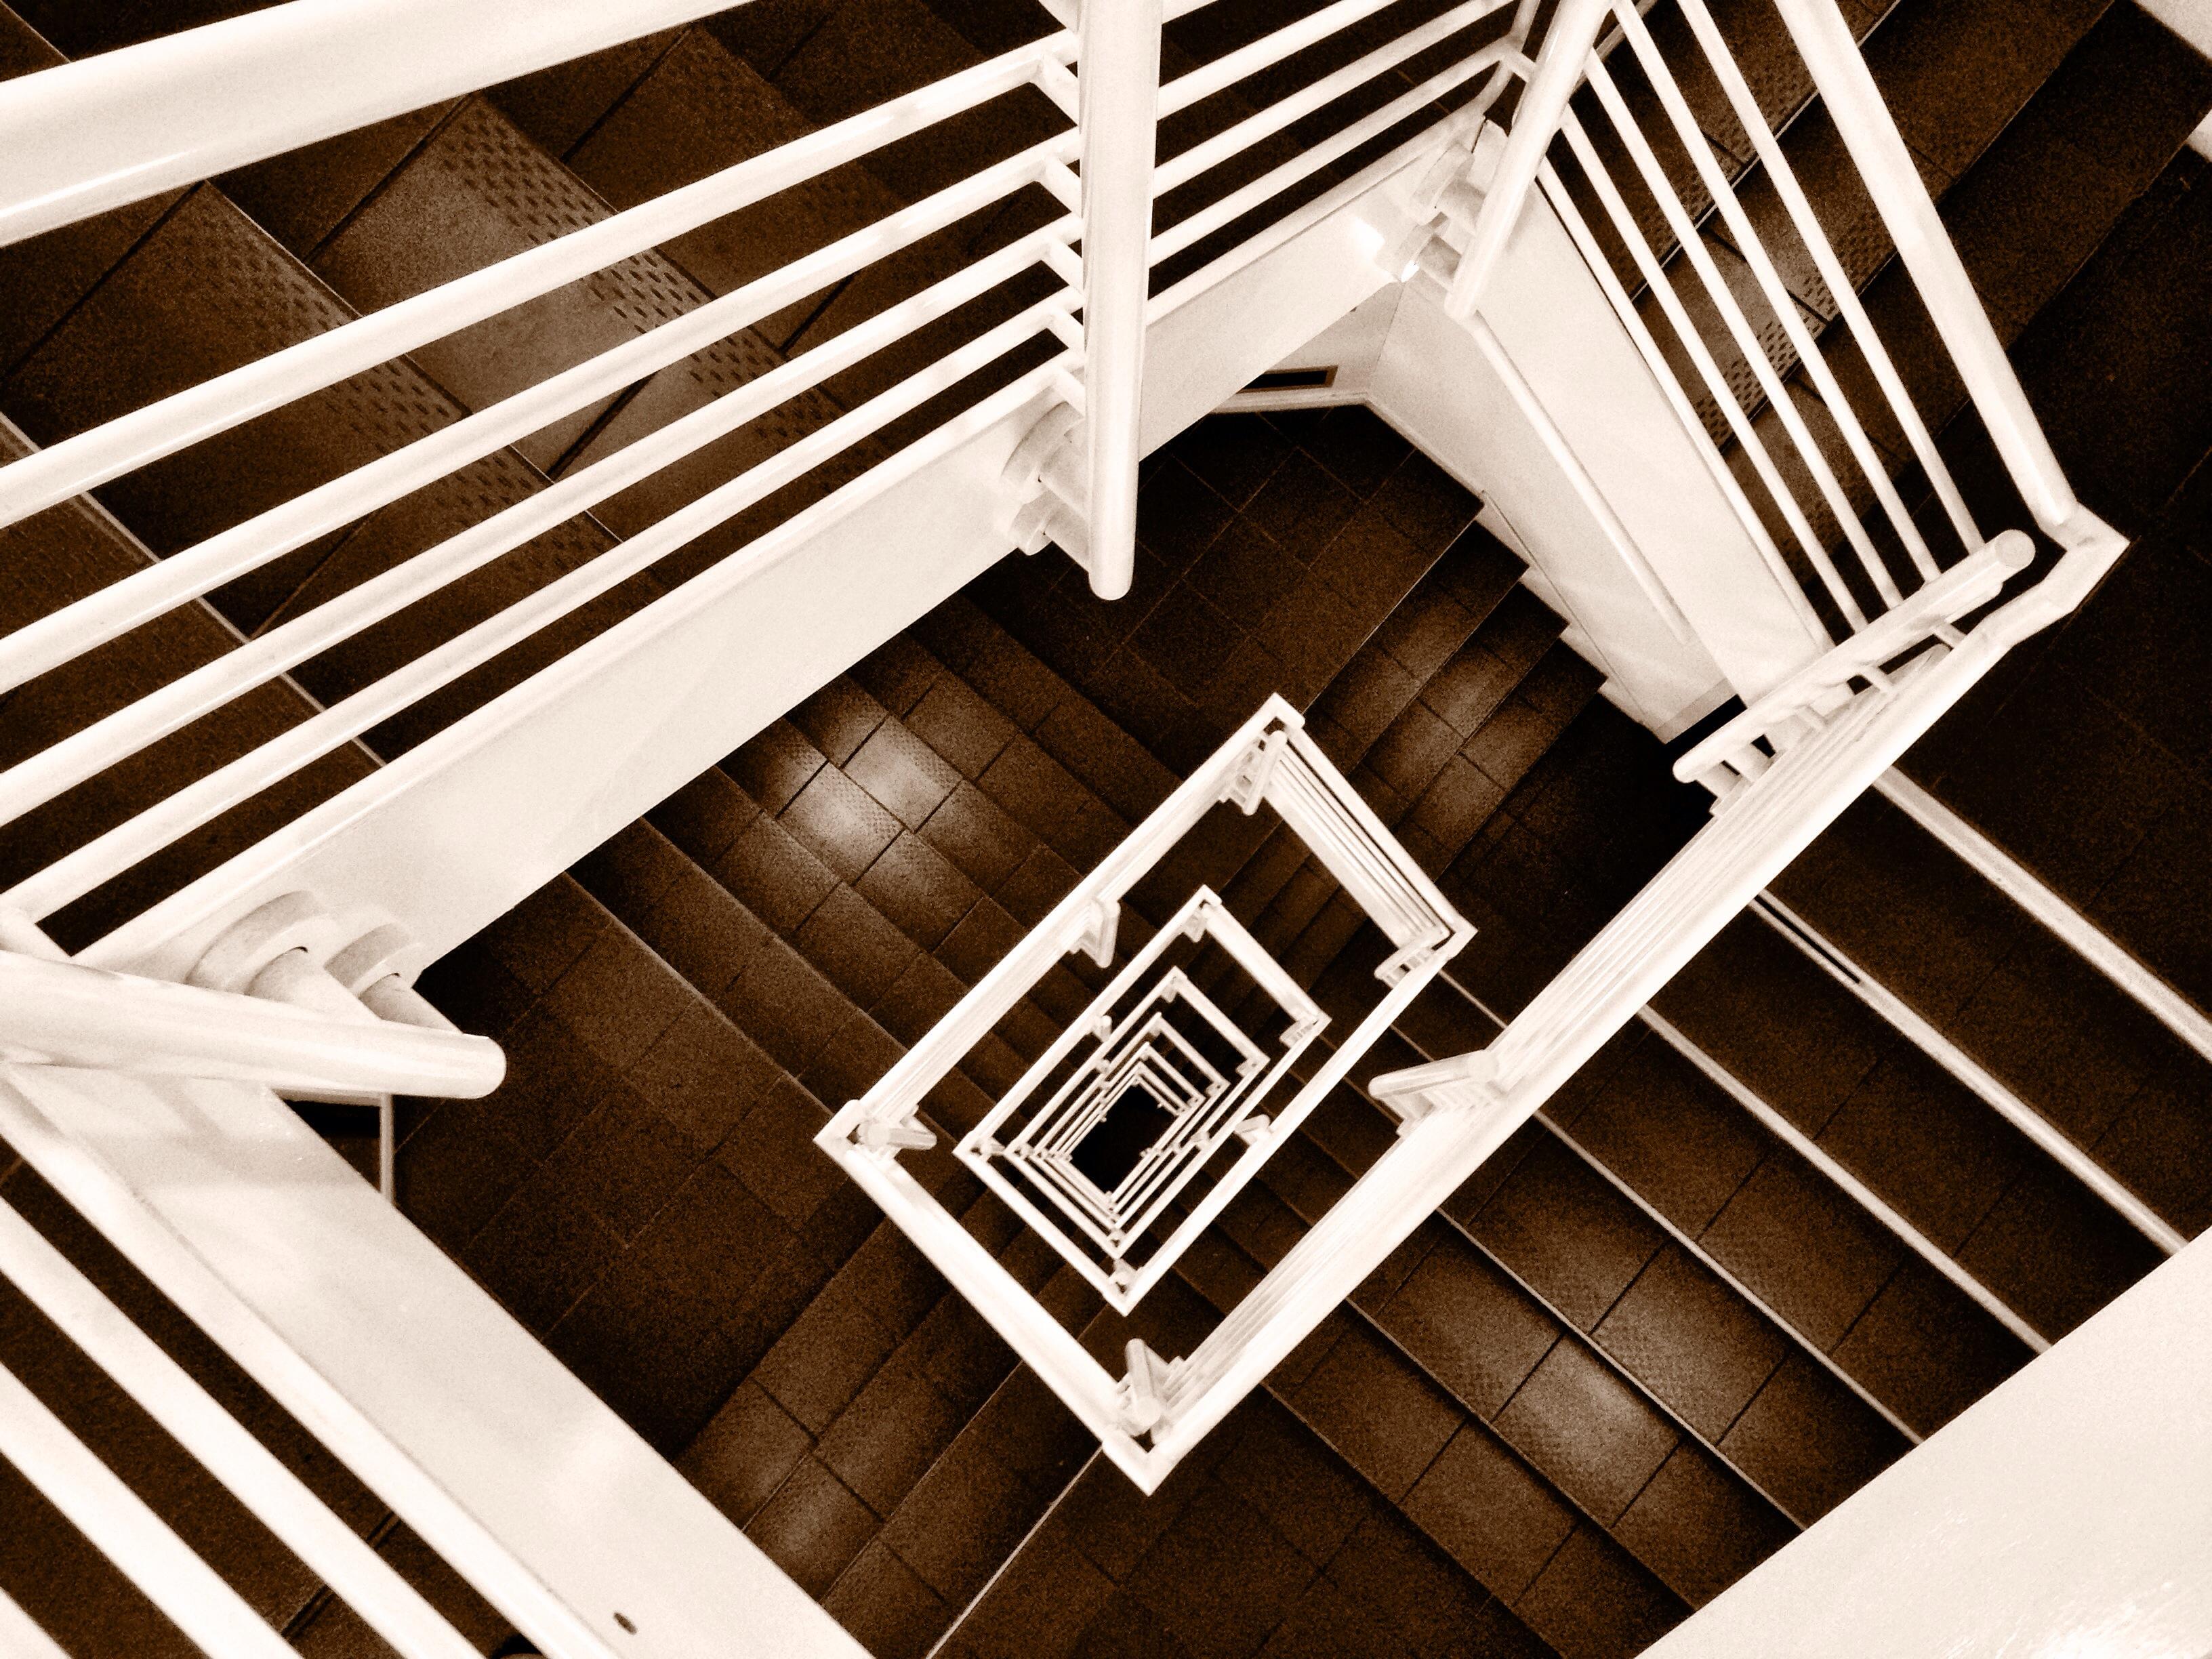 Wallpaper Monochrome Architecture Building Photography